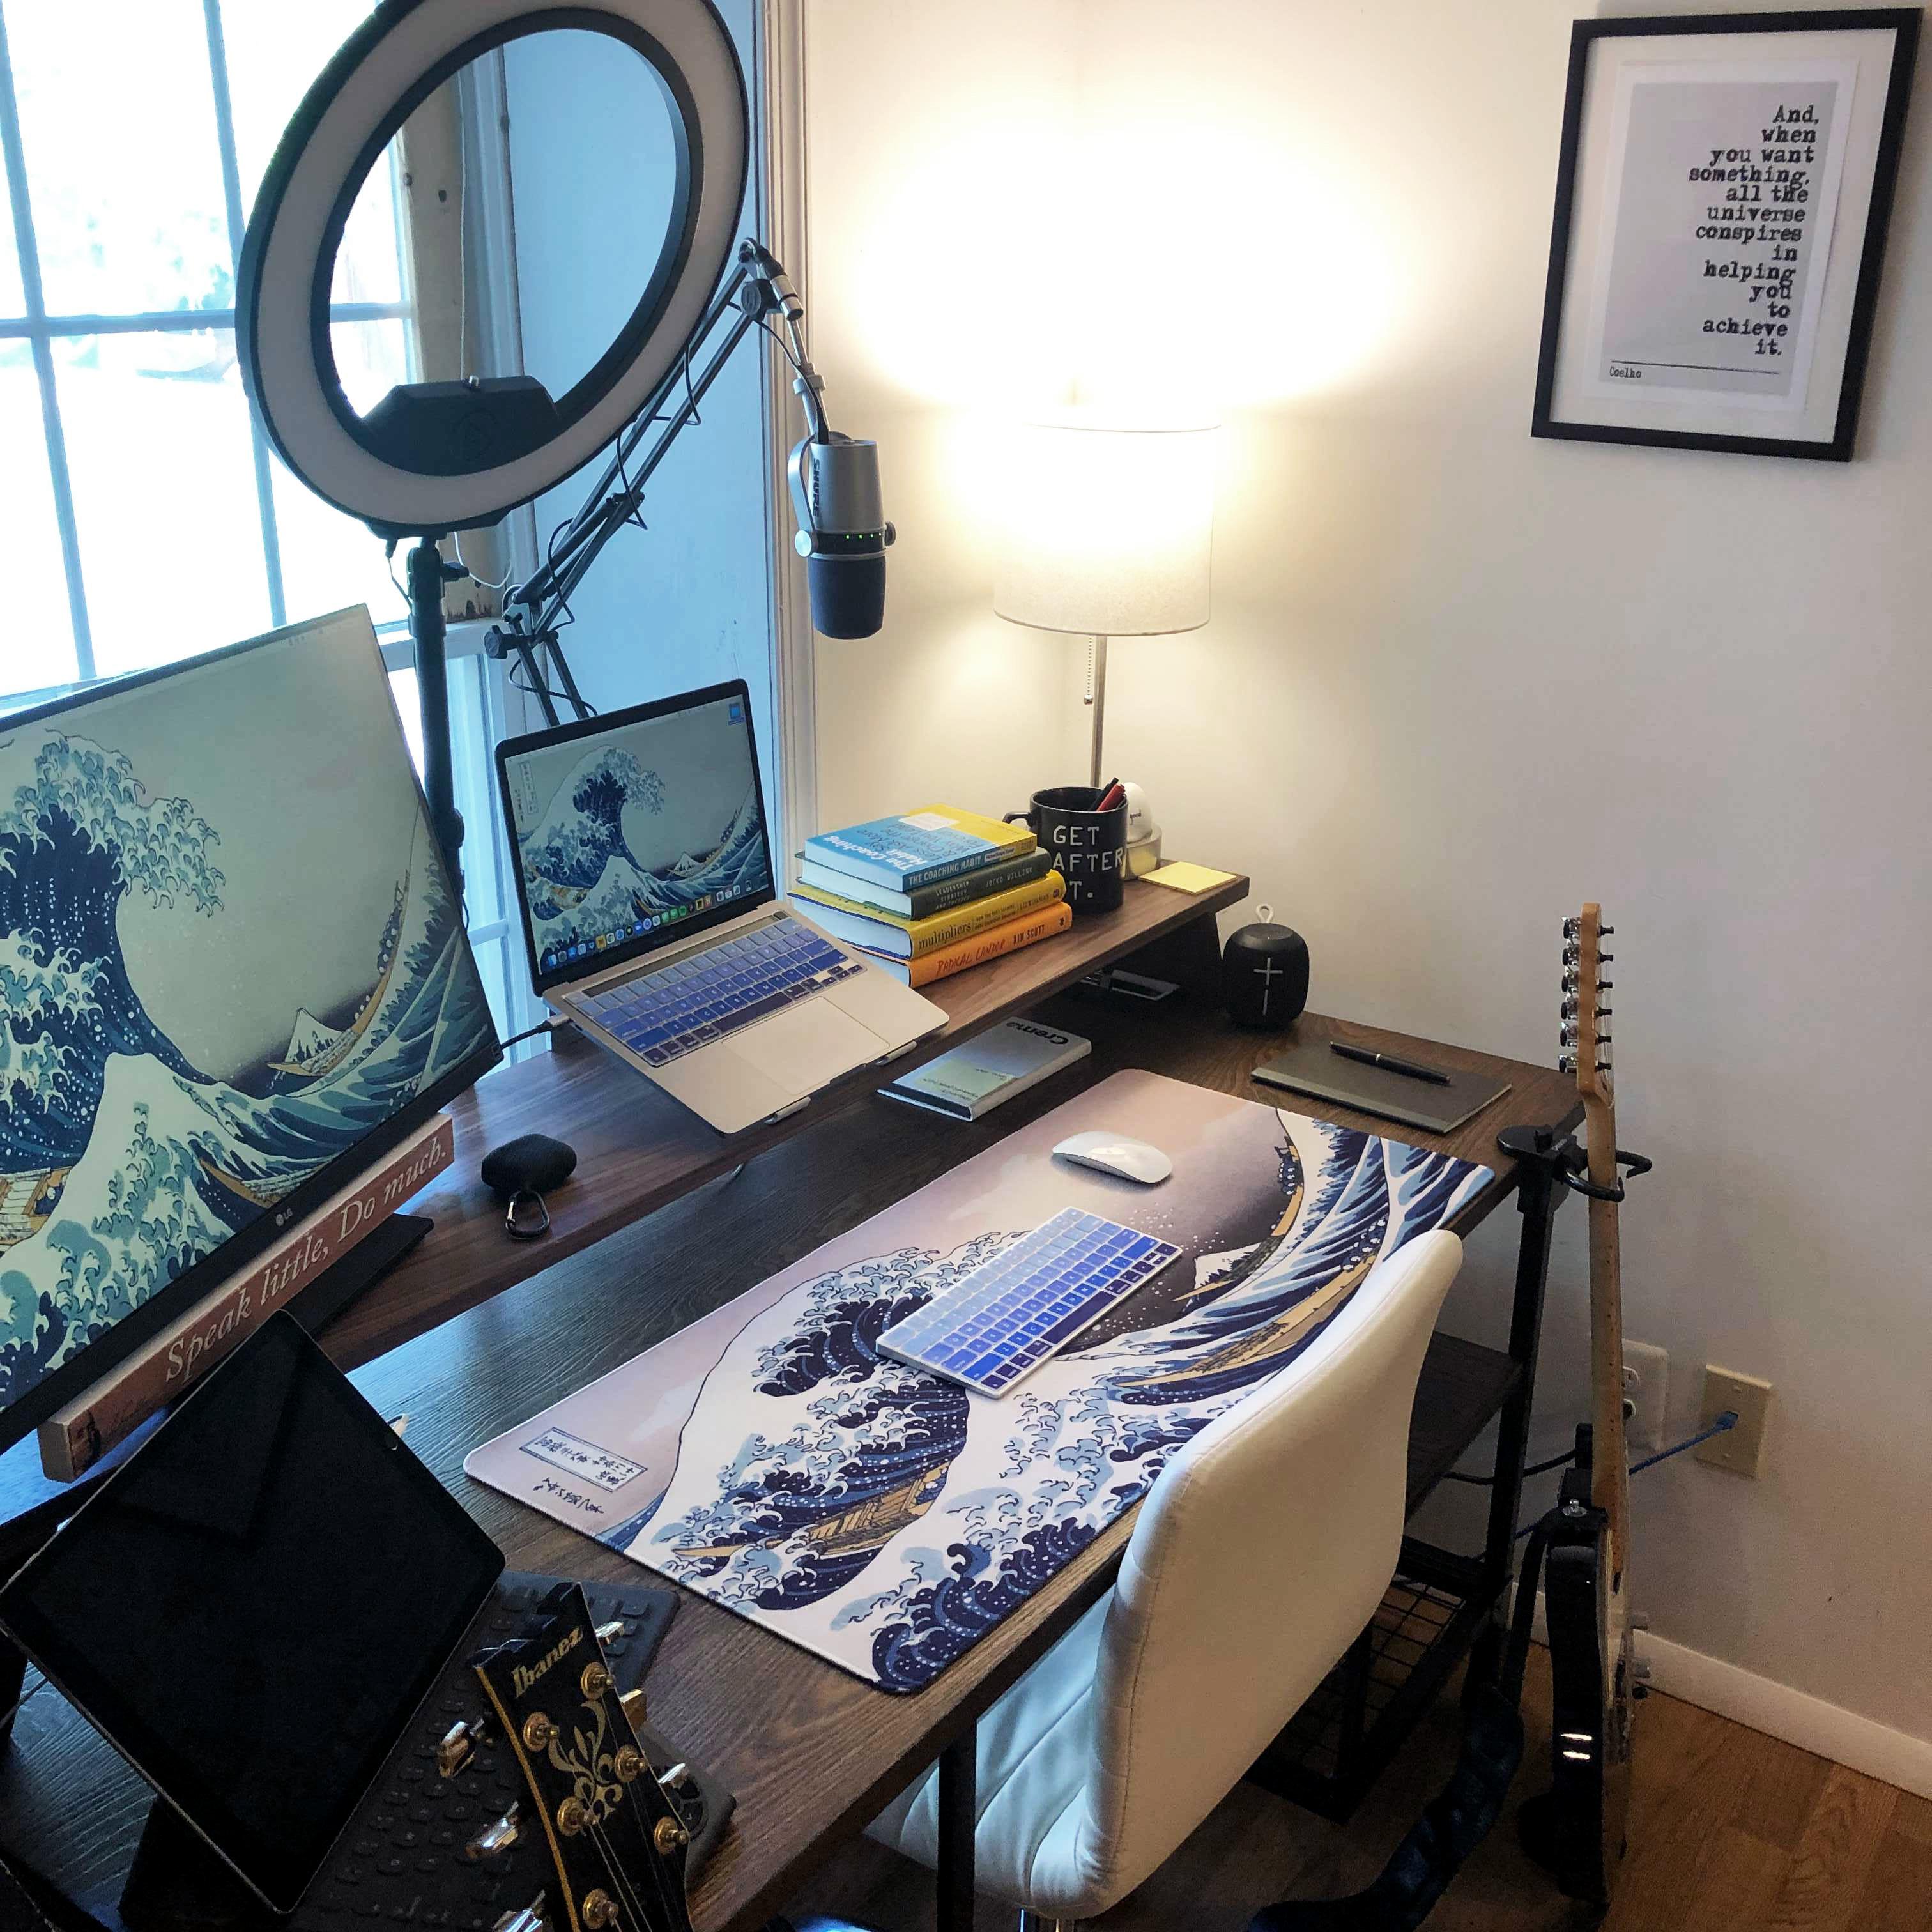 Brandon's Desk